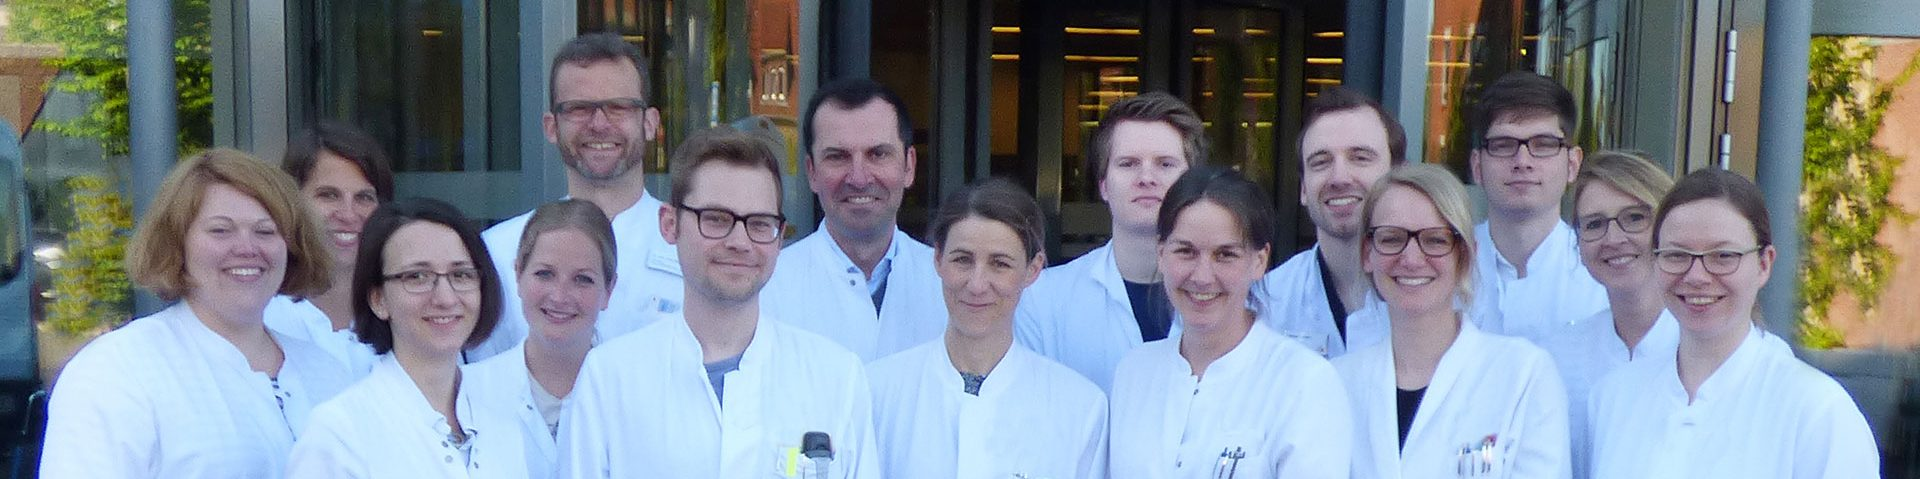 Neurologie Team Christophorus Kliniken